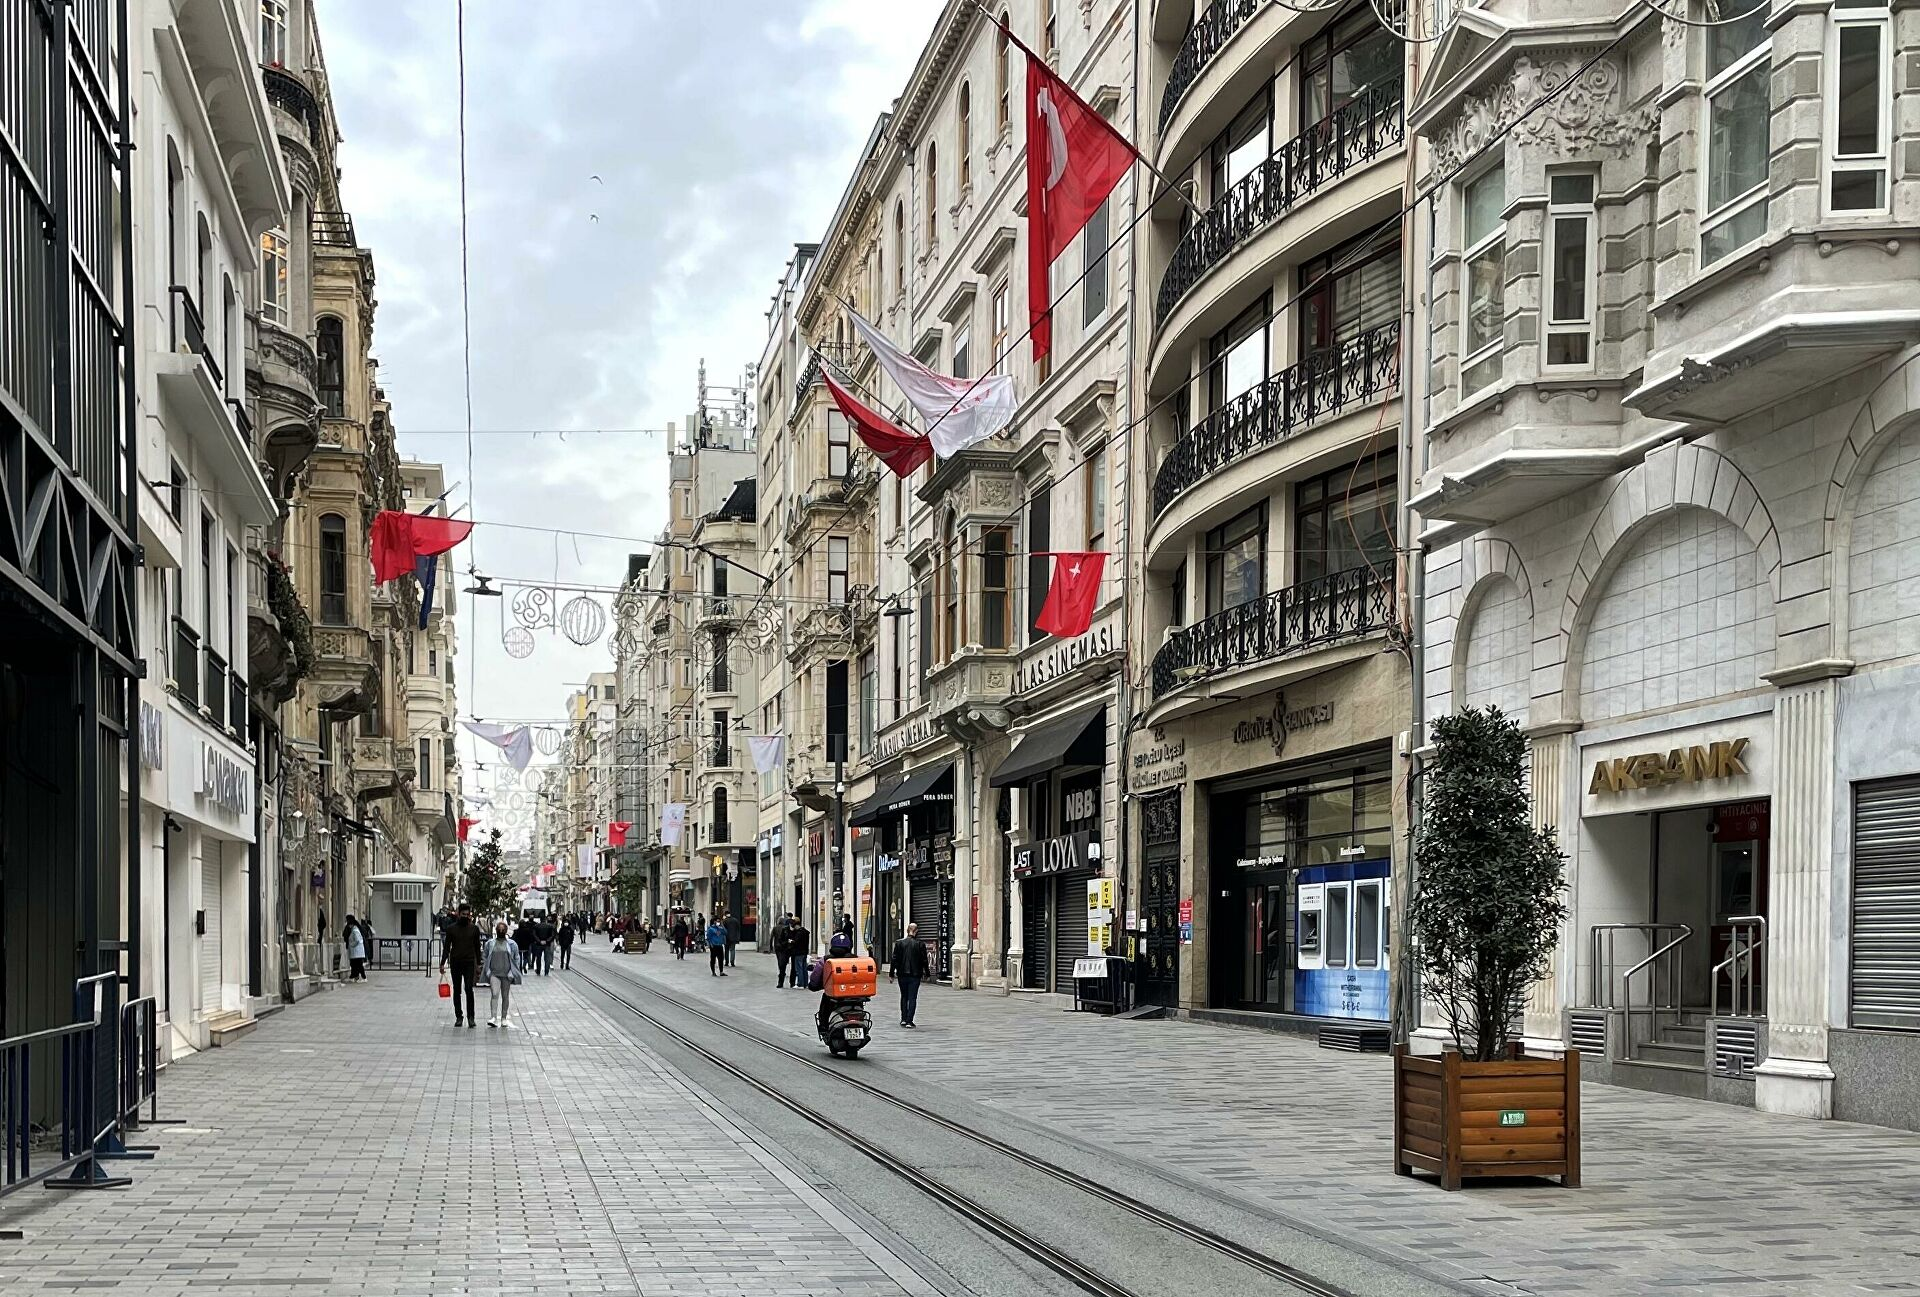 Turkey will tighten lockdown conditions